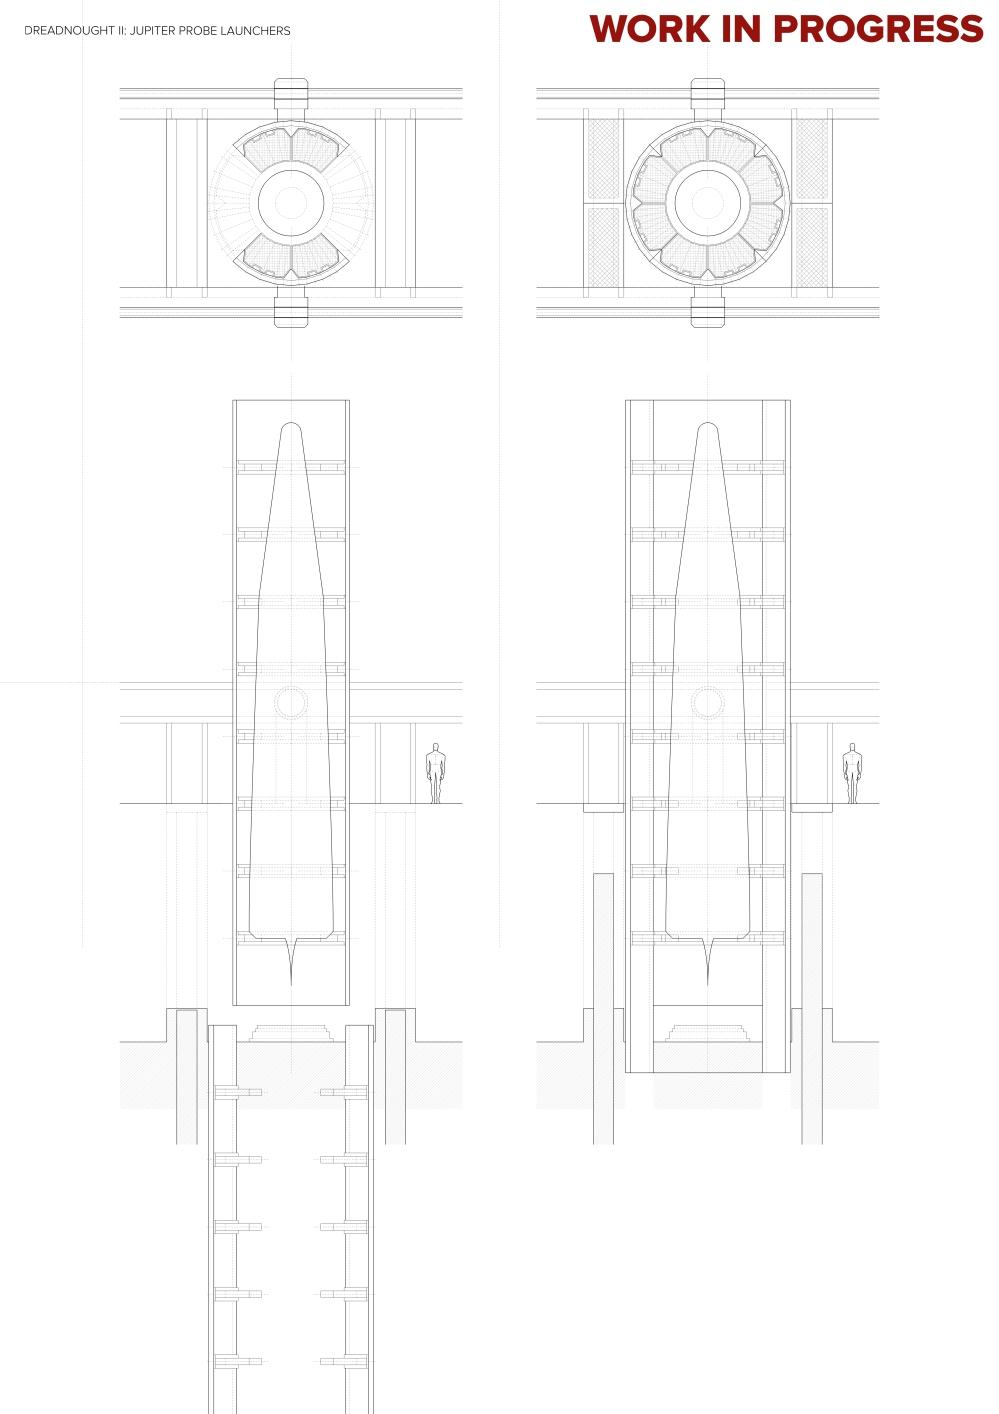 160605-AJPMSC-DreadnoughtII_LauncherTestPlans